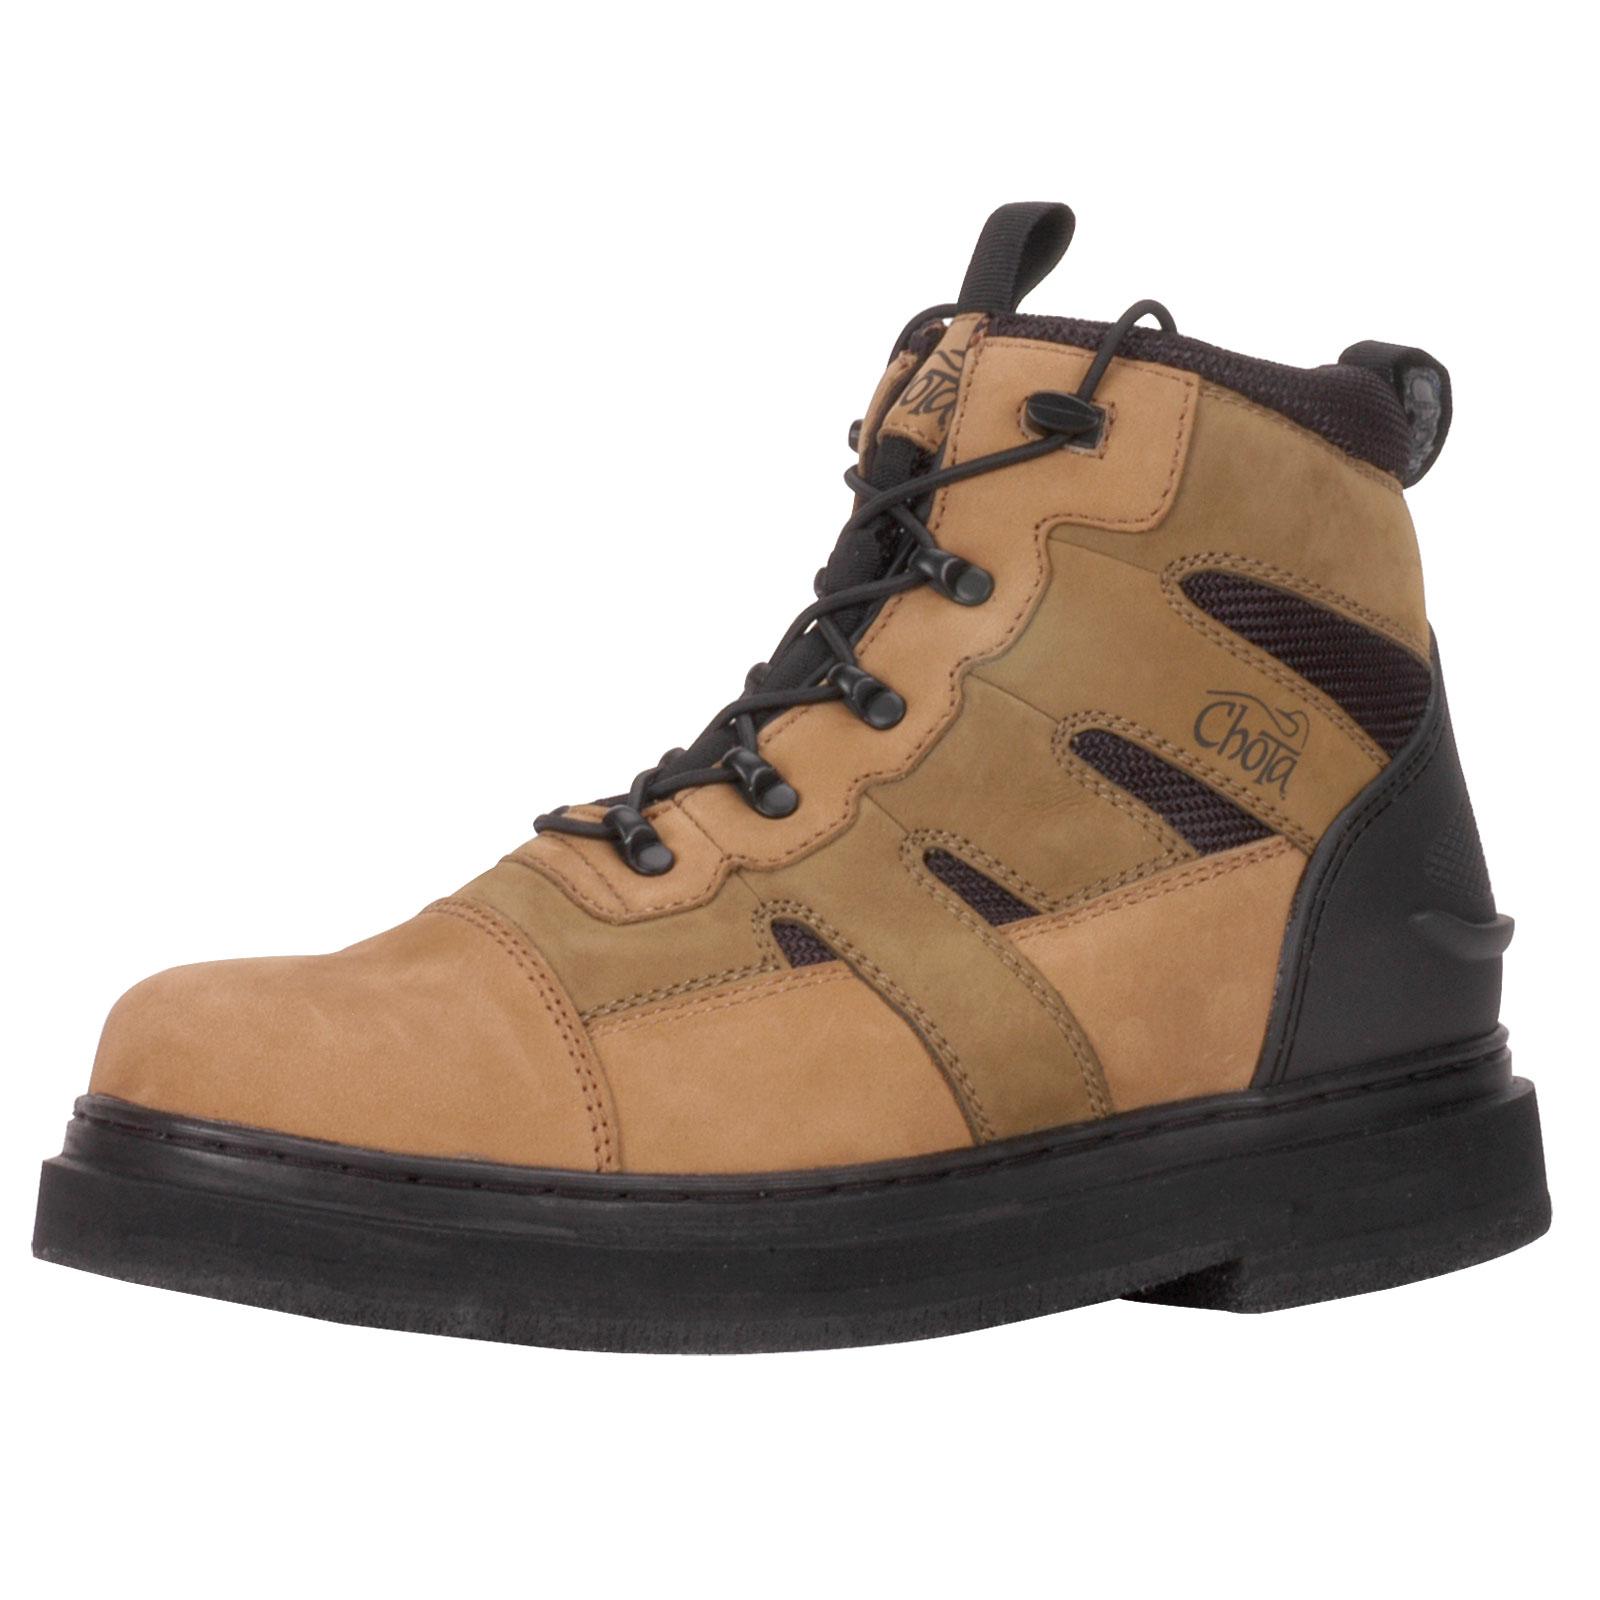 Chota Outdoor Gear STL Plus Wading Boots Fly Fishing Felt...